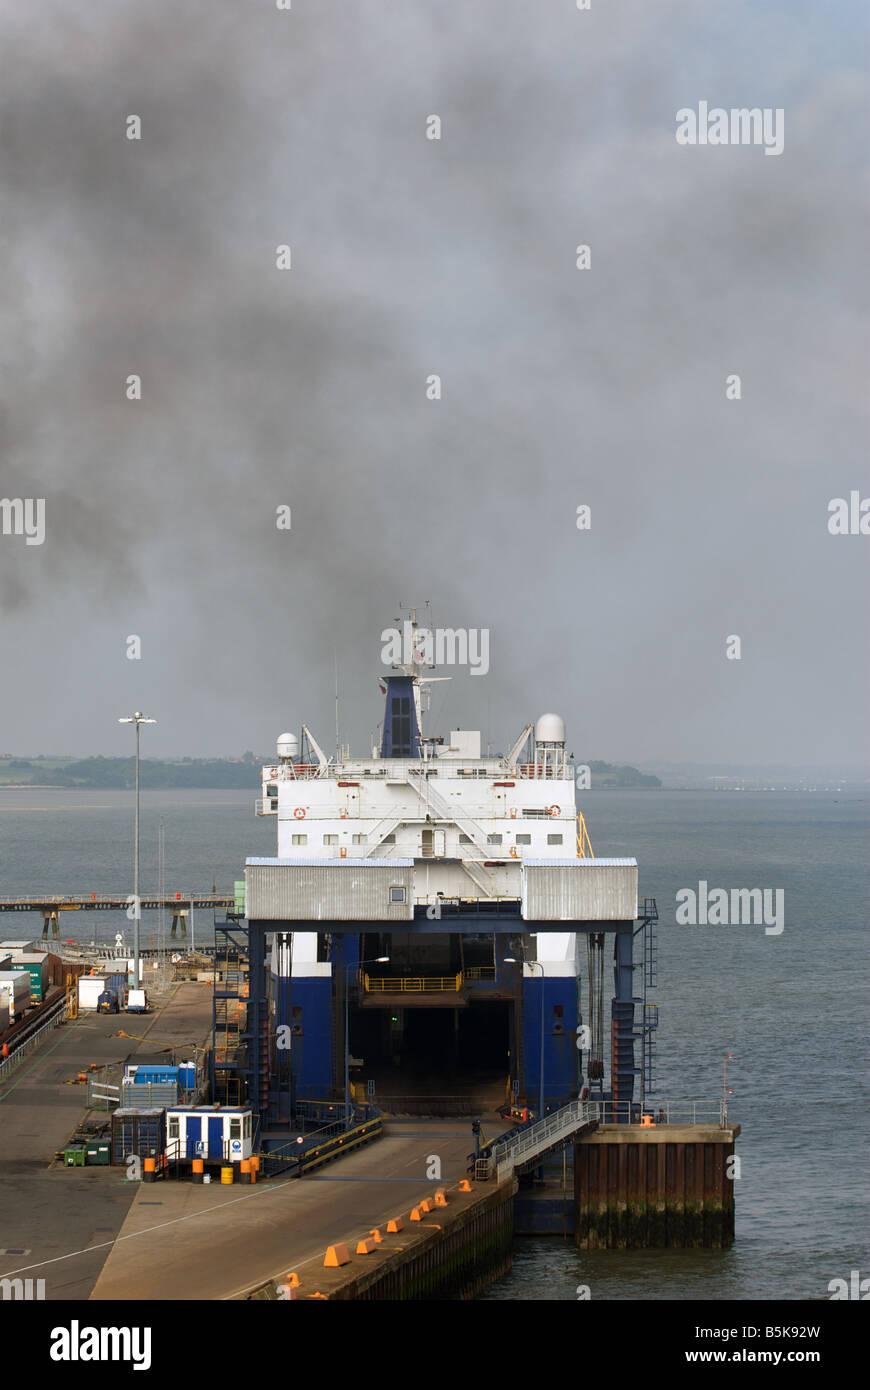 Stena Line Ro-Ro lorry ferry loading cargo at Harwich International Port, Essex, UK. - Stock Image